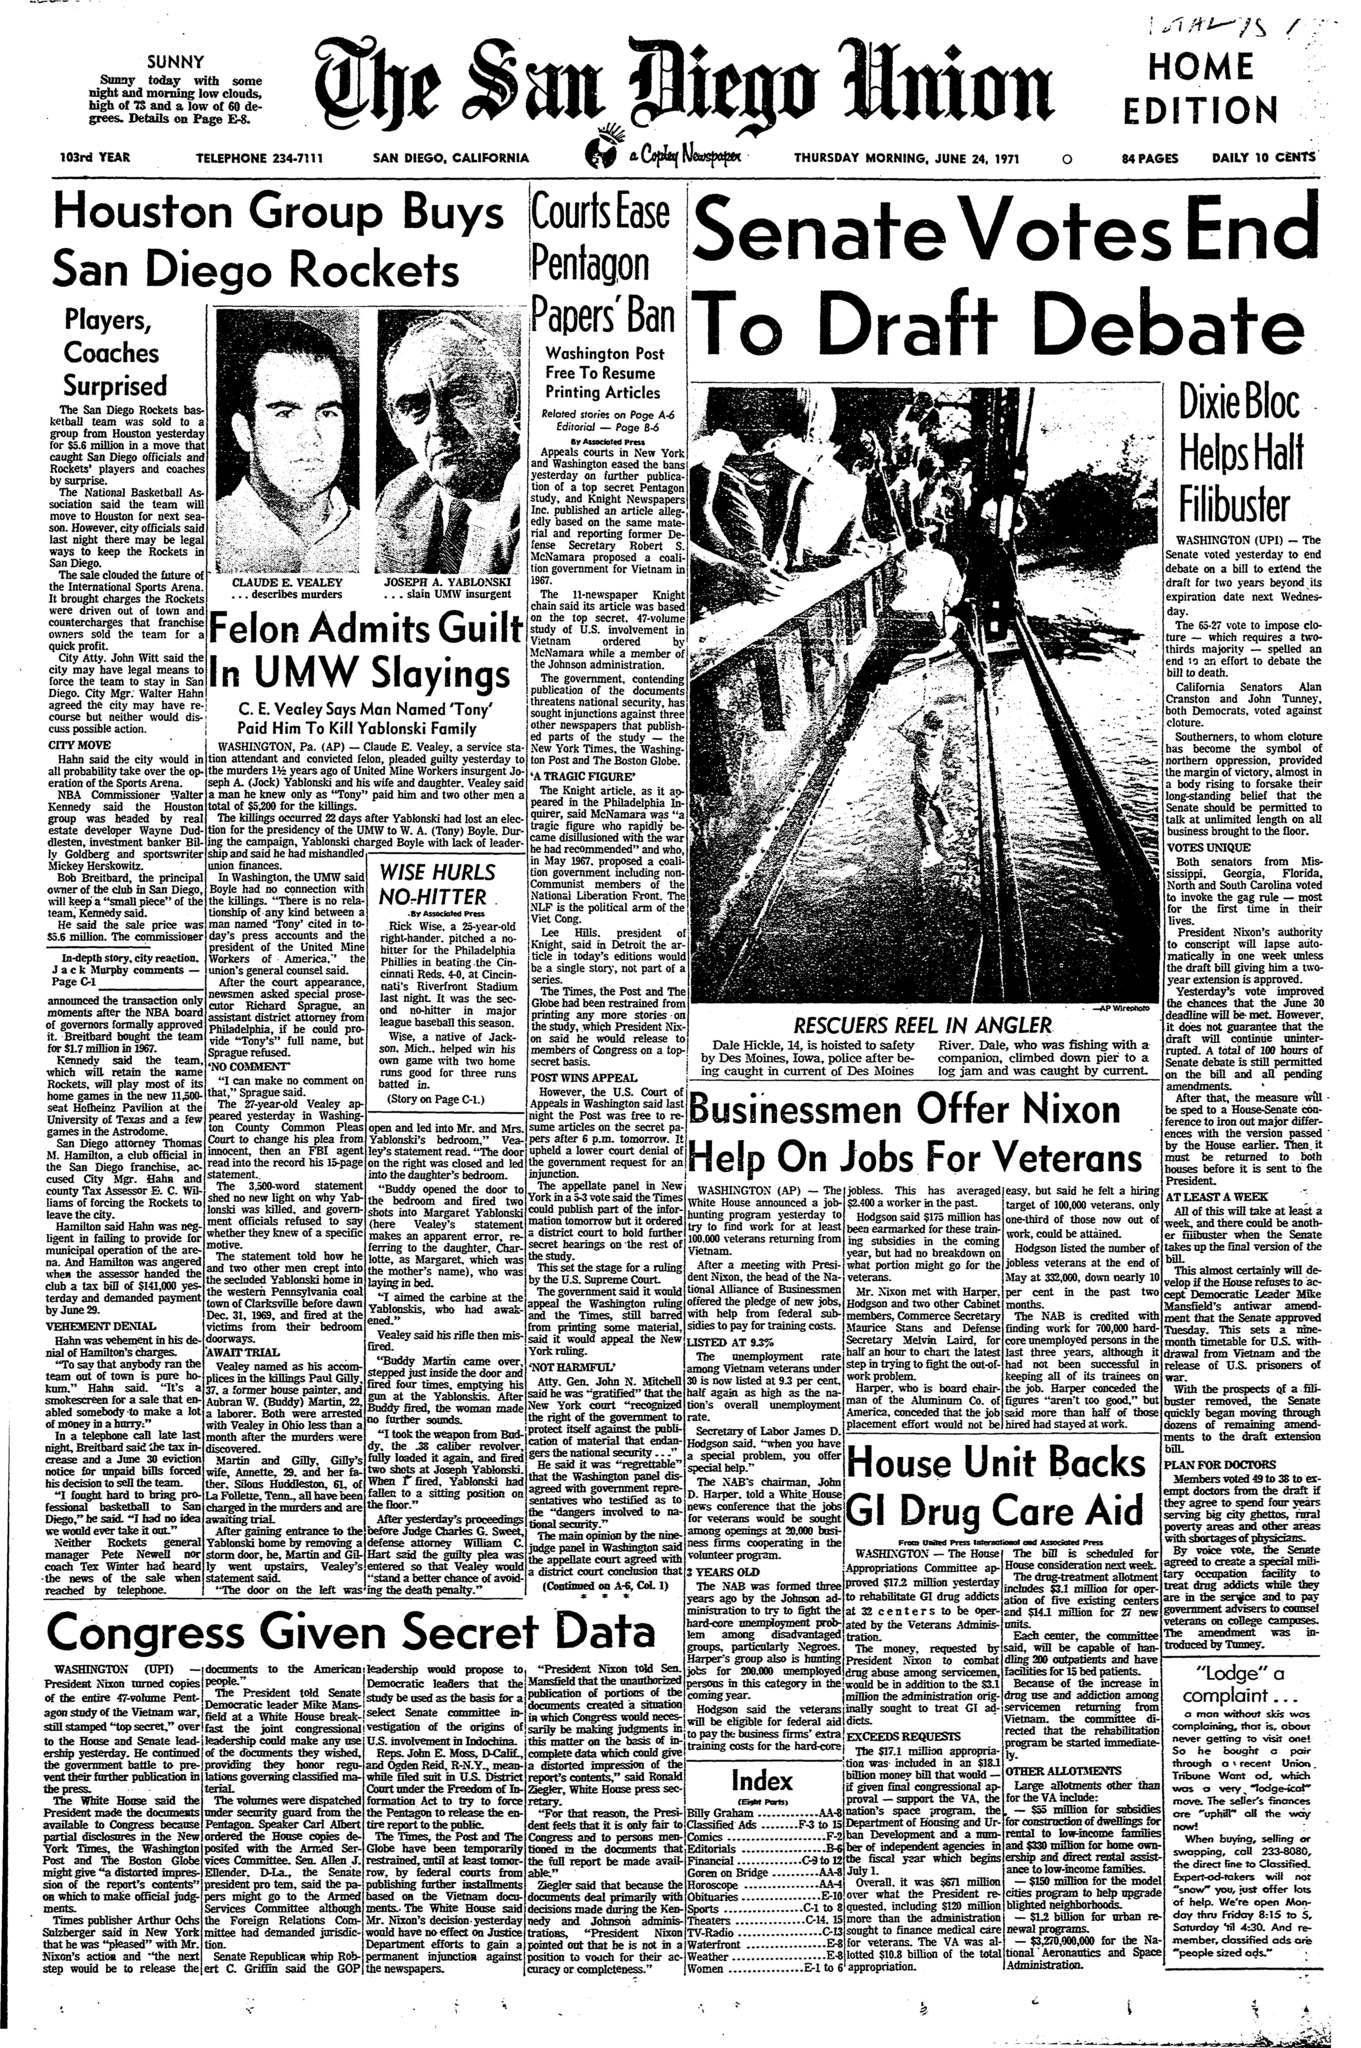 June 24, 1971